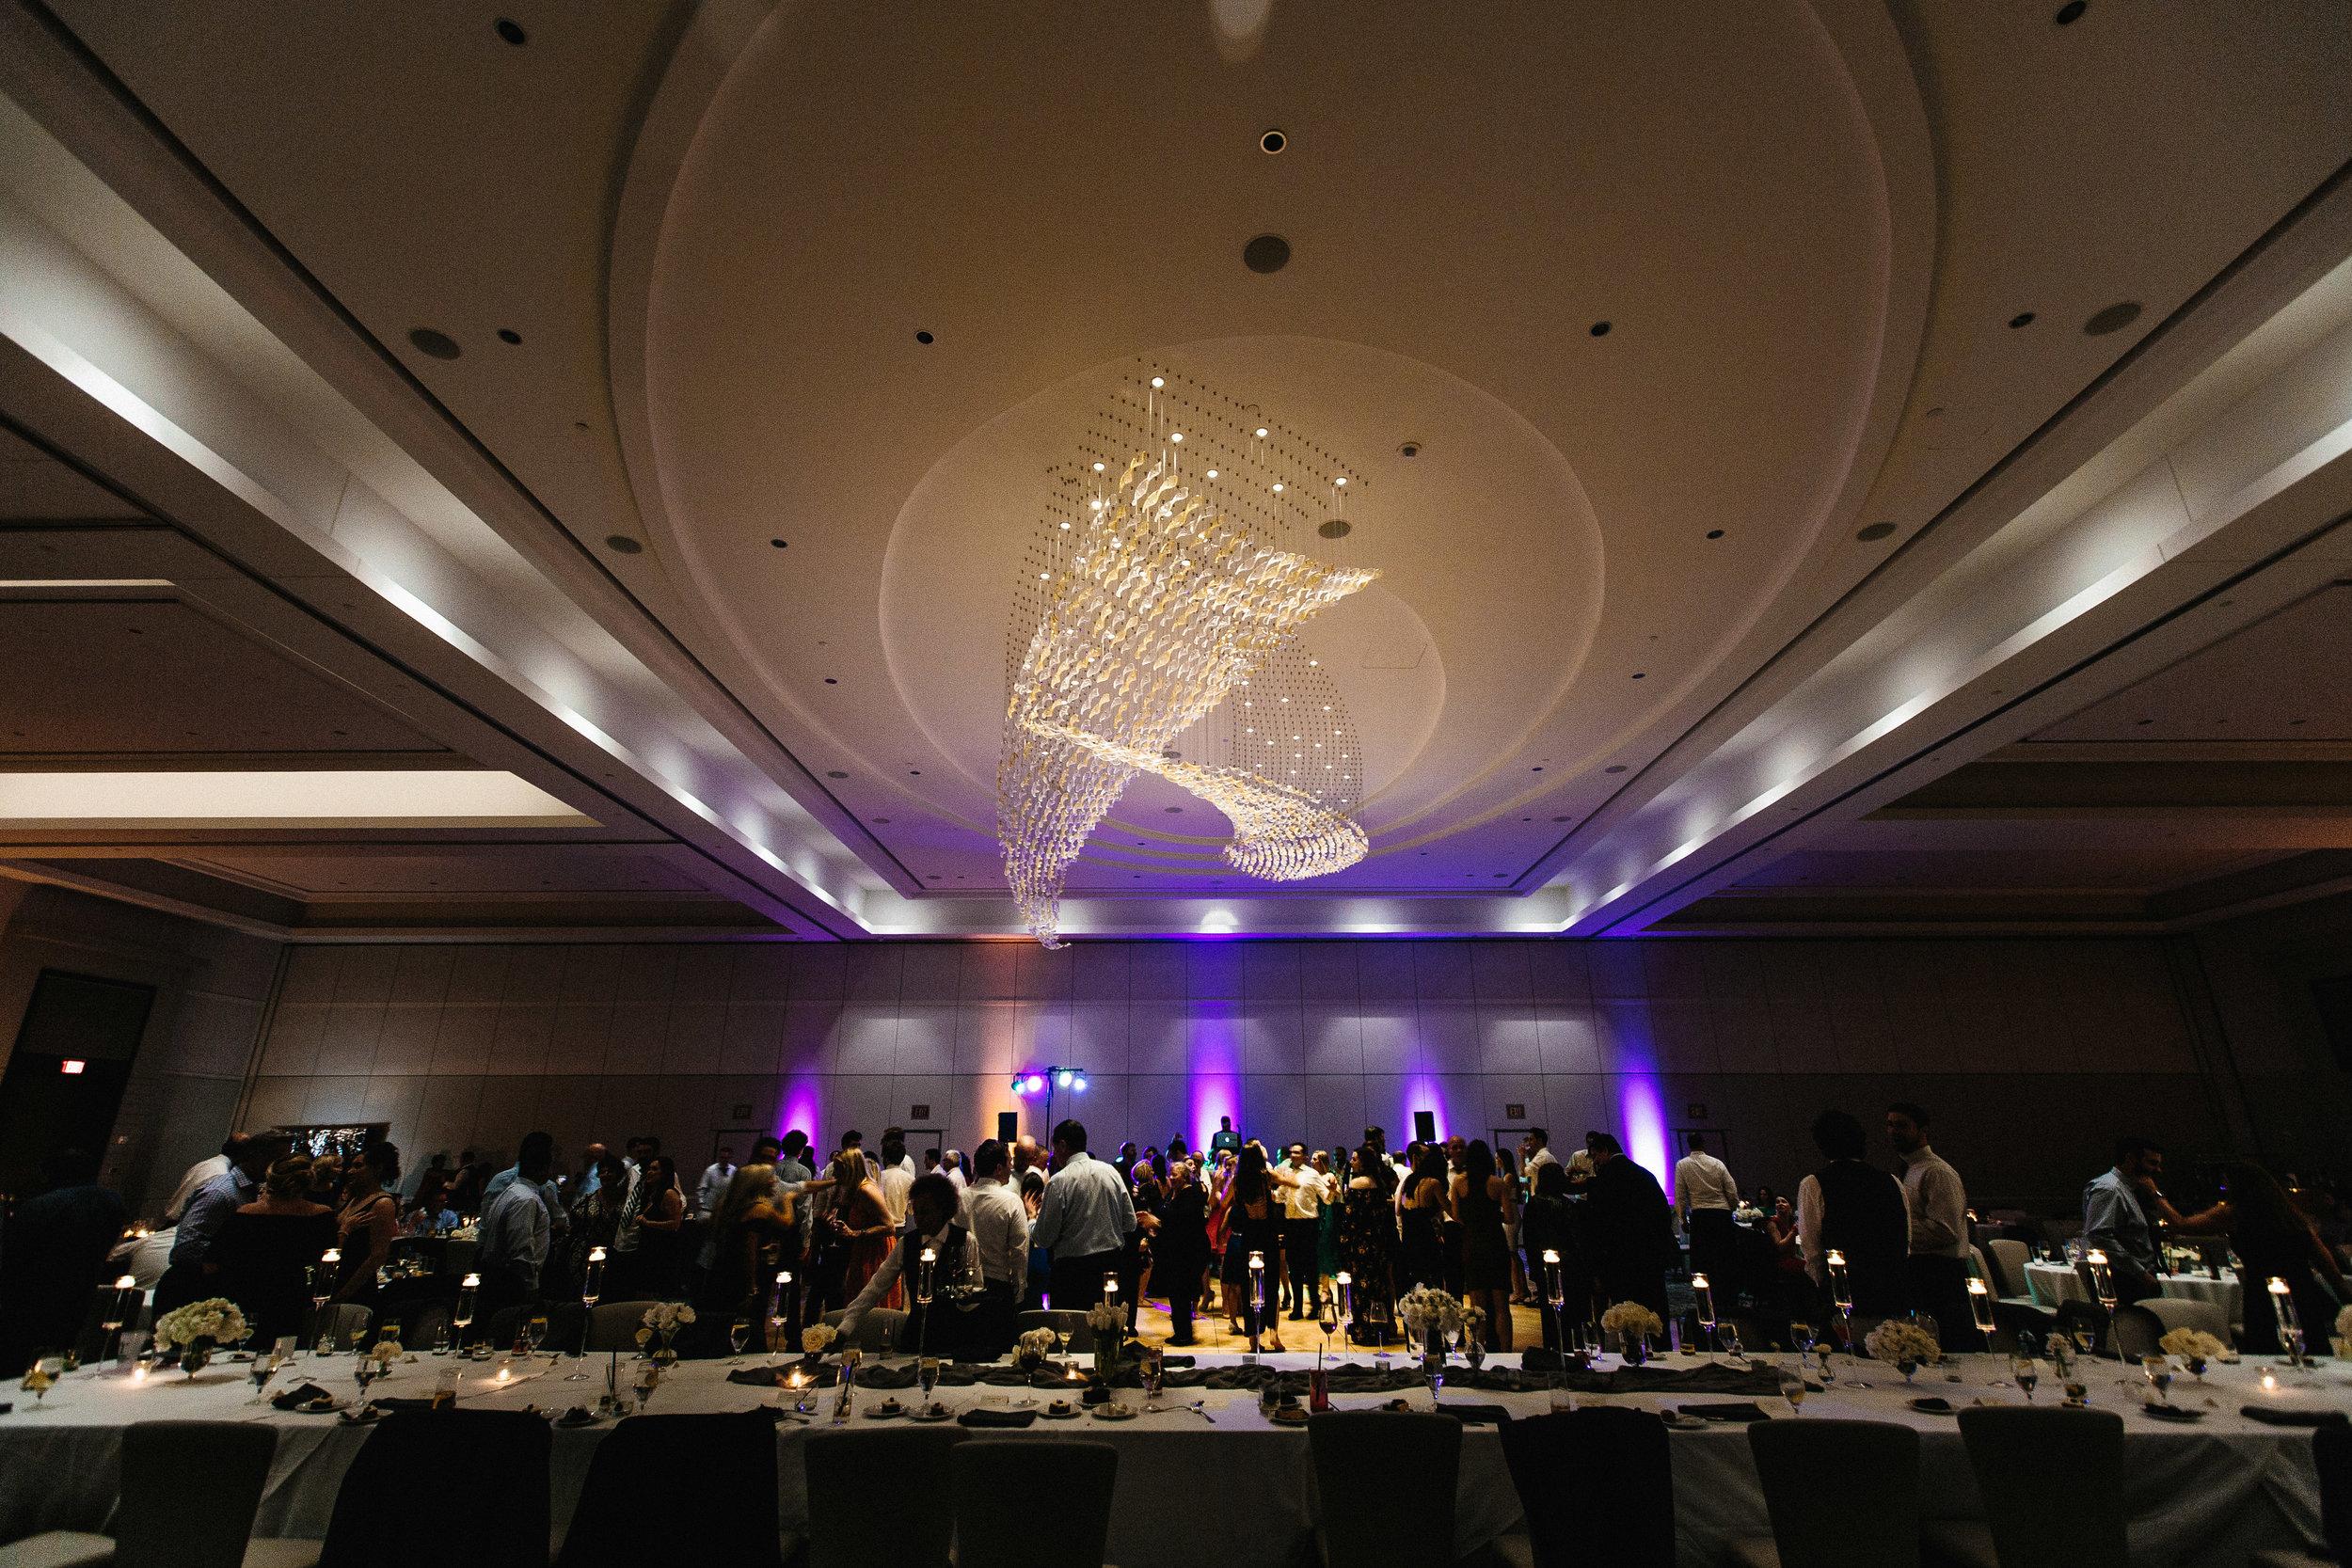 roswell_st_peter_chanel_catholic_avalon_hotel_alpharetta_wedding-2305.jpg